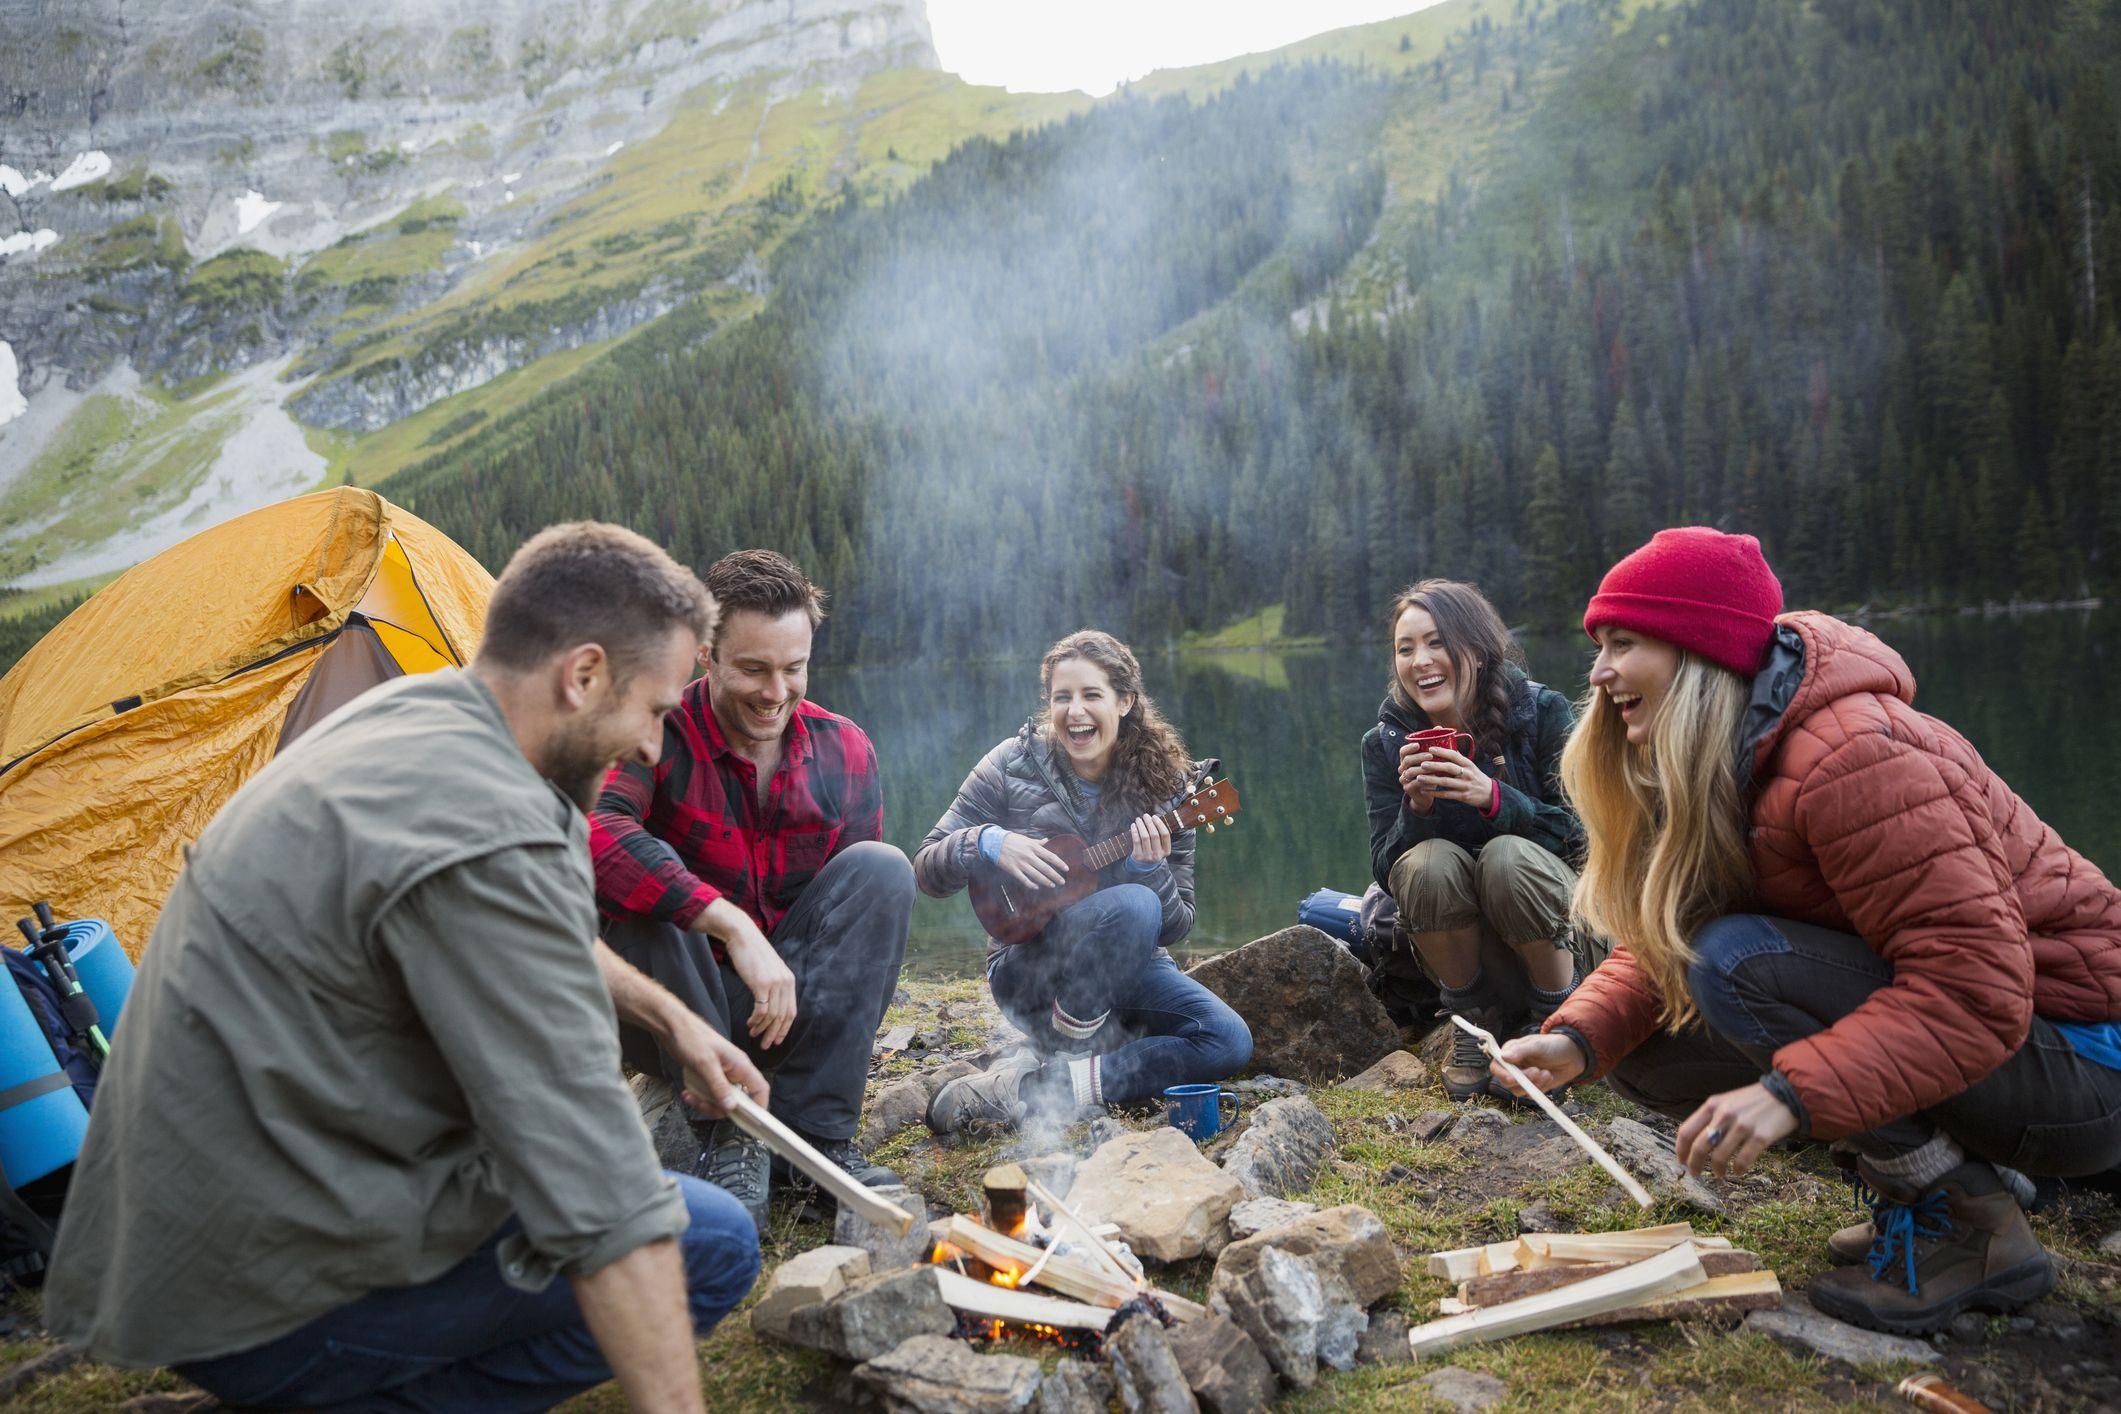 Explore Women/'s V-Neck T-Shirt Outdoors Camping Tourism Nature Campfire Tent